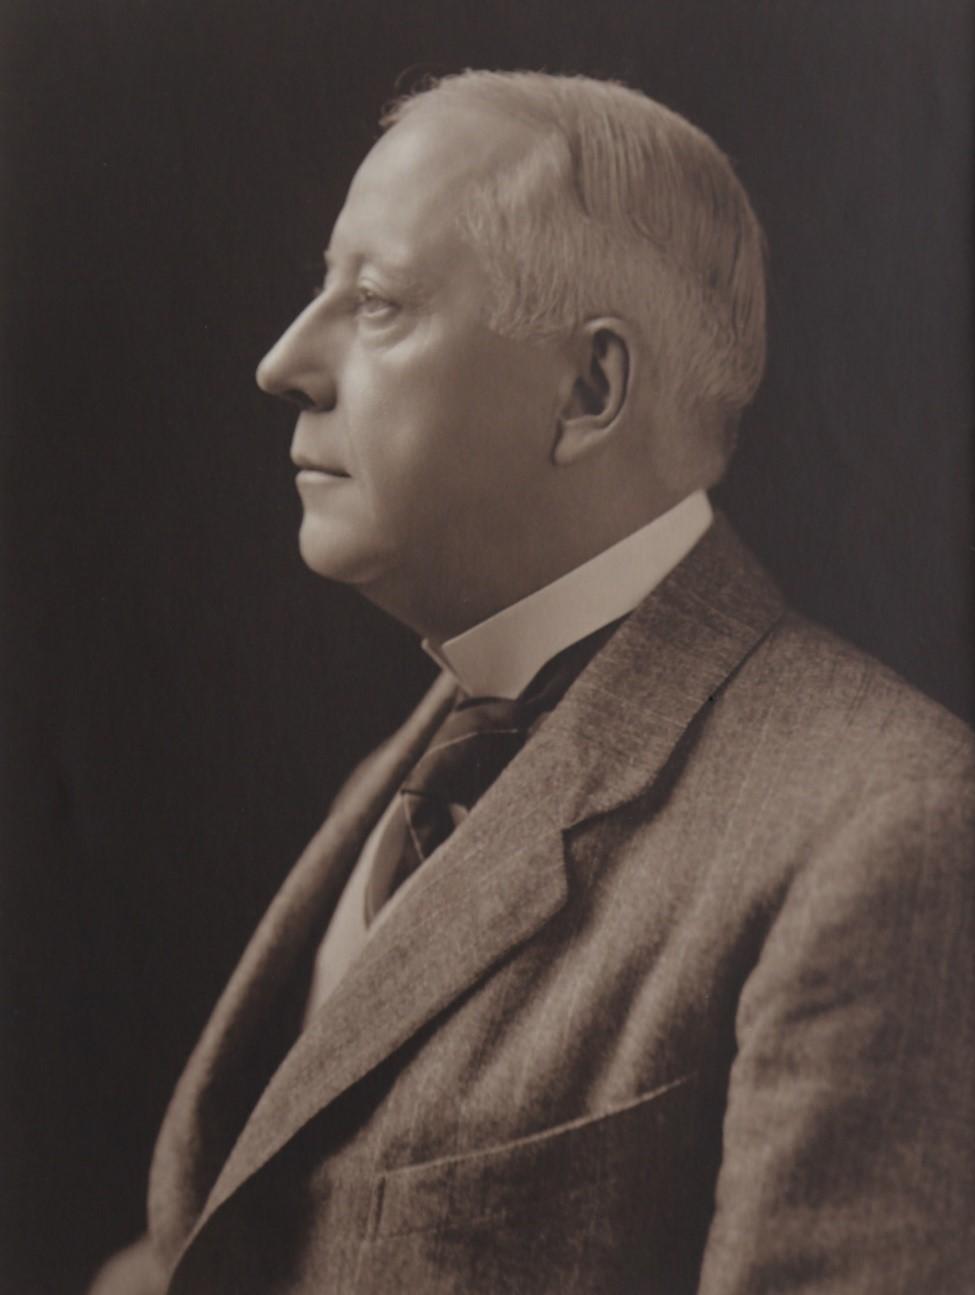 Charles Deering (1852-1927) was an industrialist, philanthropist, art collector, and environmentalist